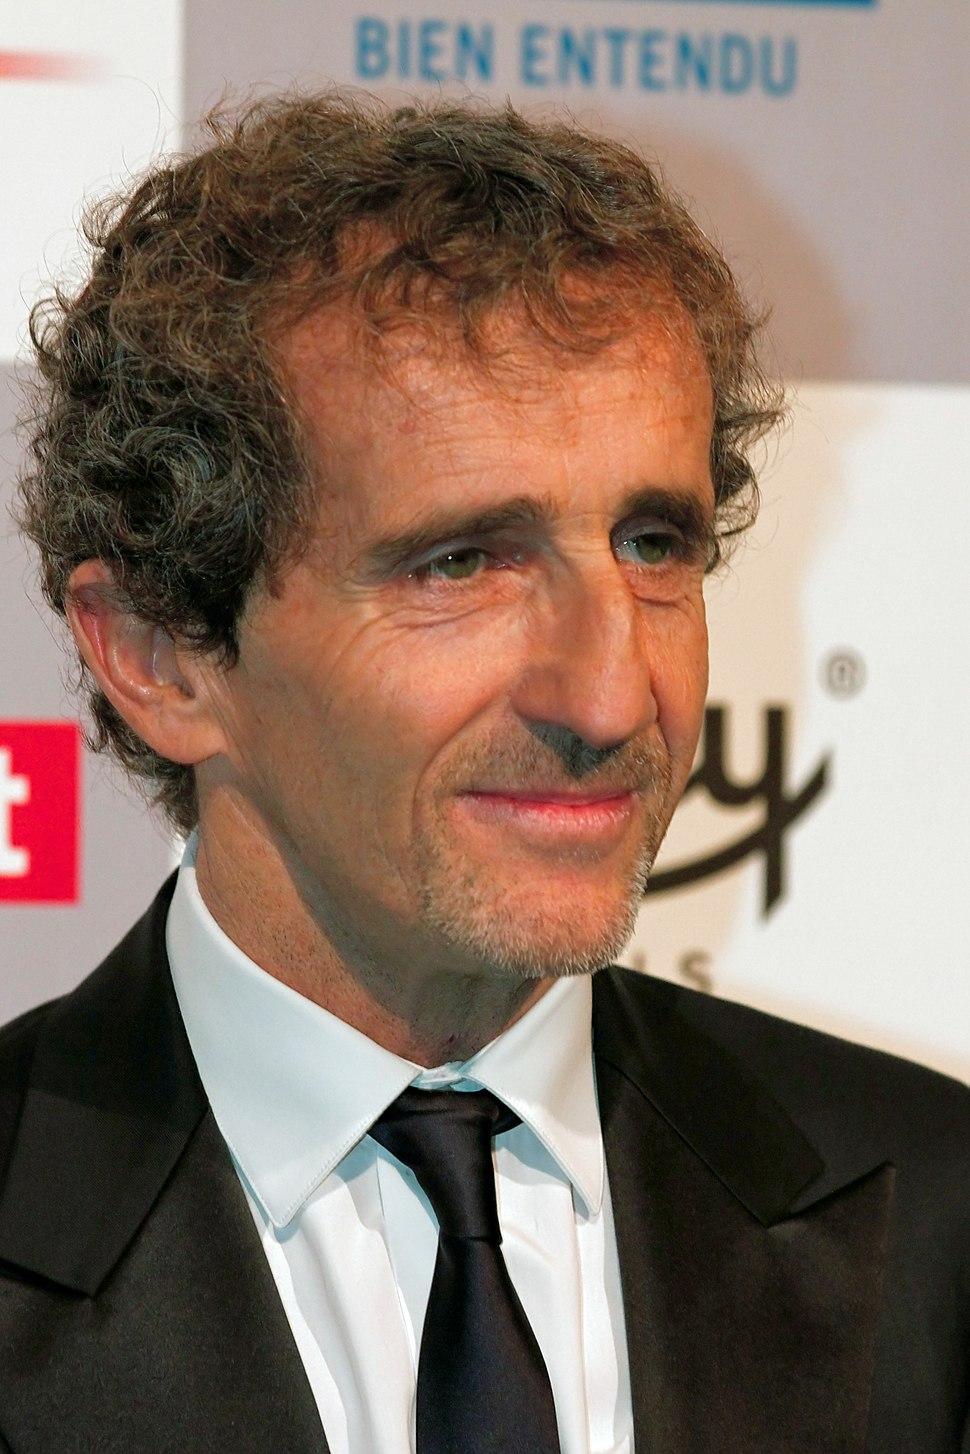 Festival automobile international 2012 - Photocall - Alain Prost - 013